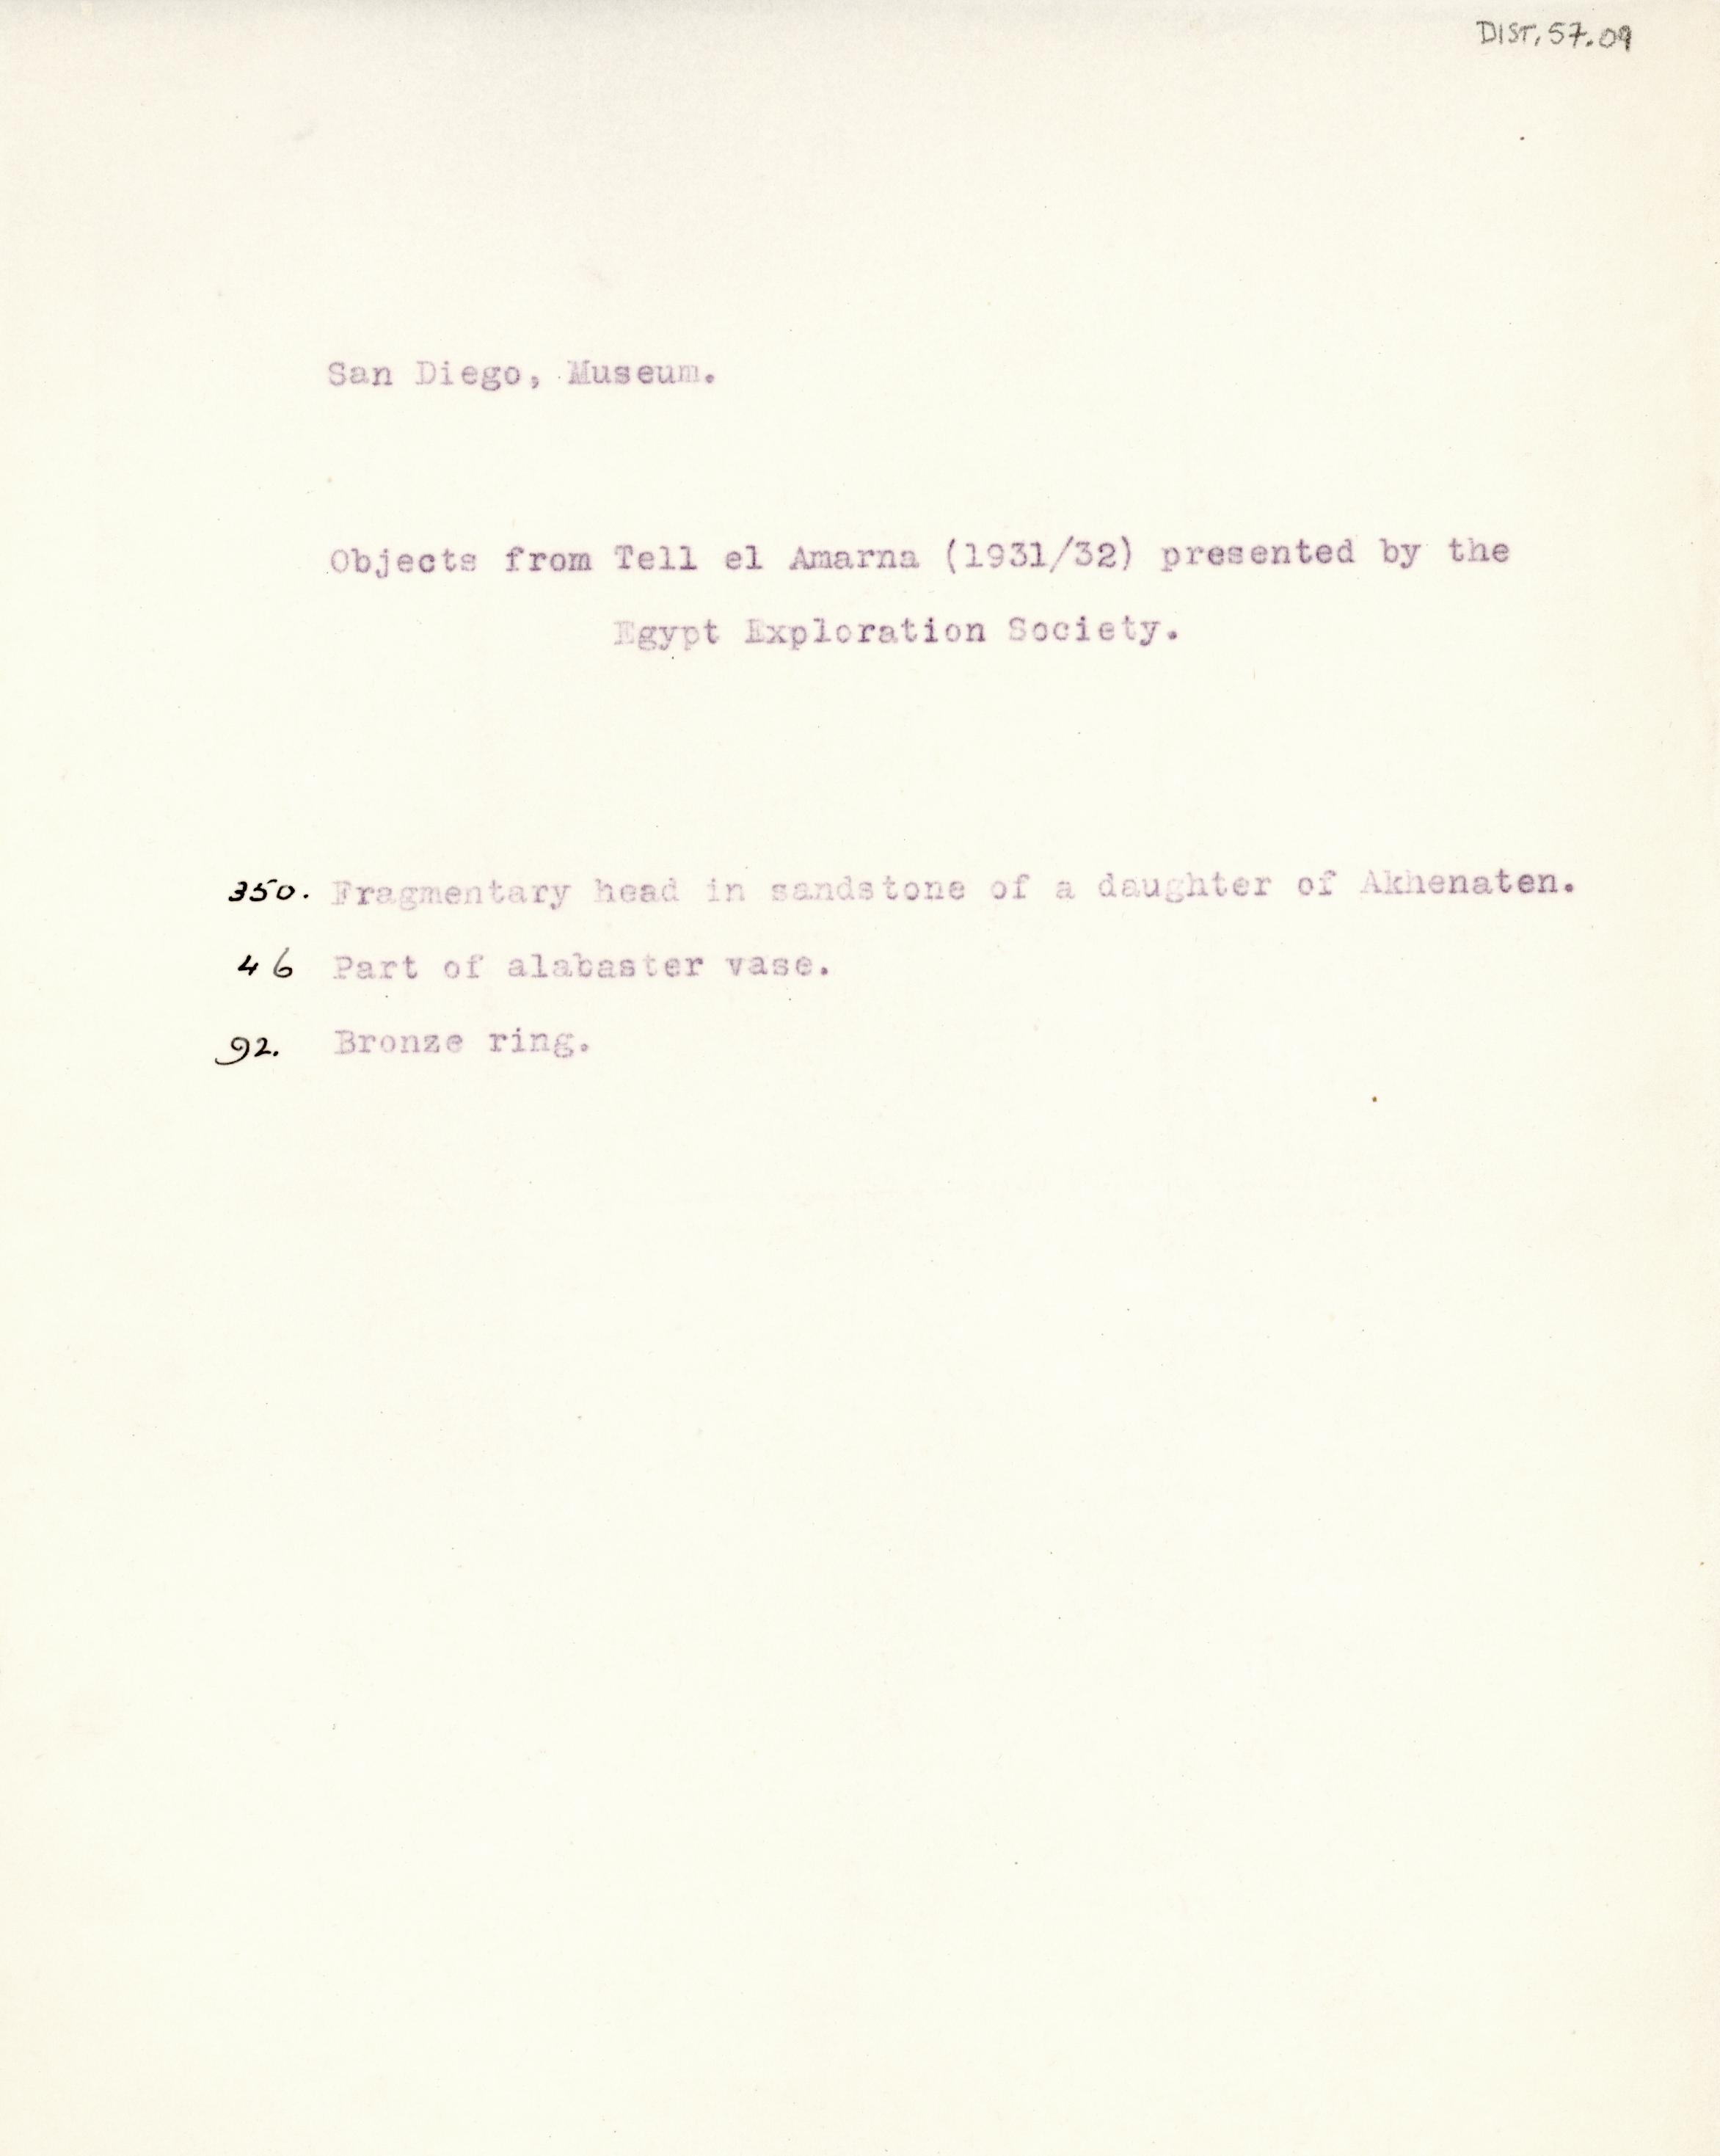 1931-34 el-Amarna DIST.57.09